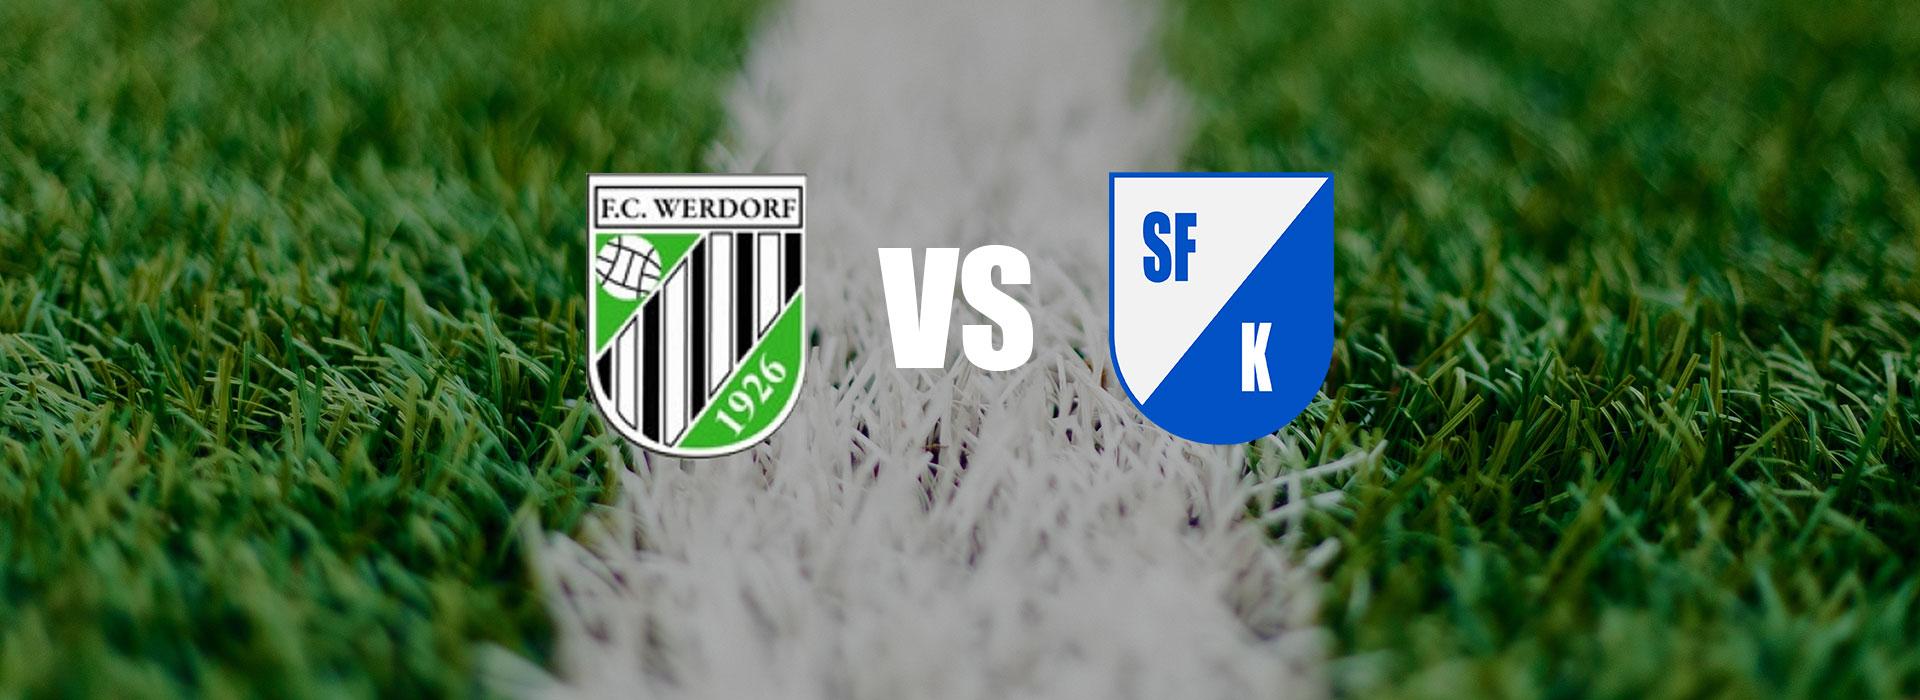 FC Werdorf SF Katzenfurt